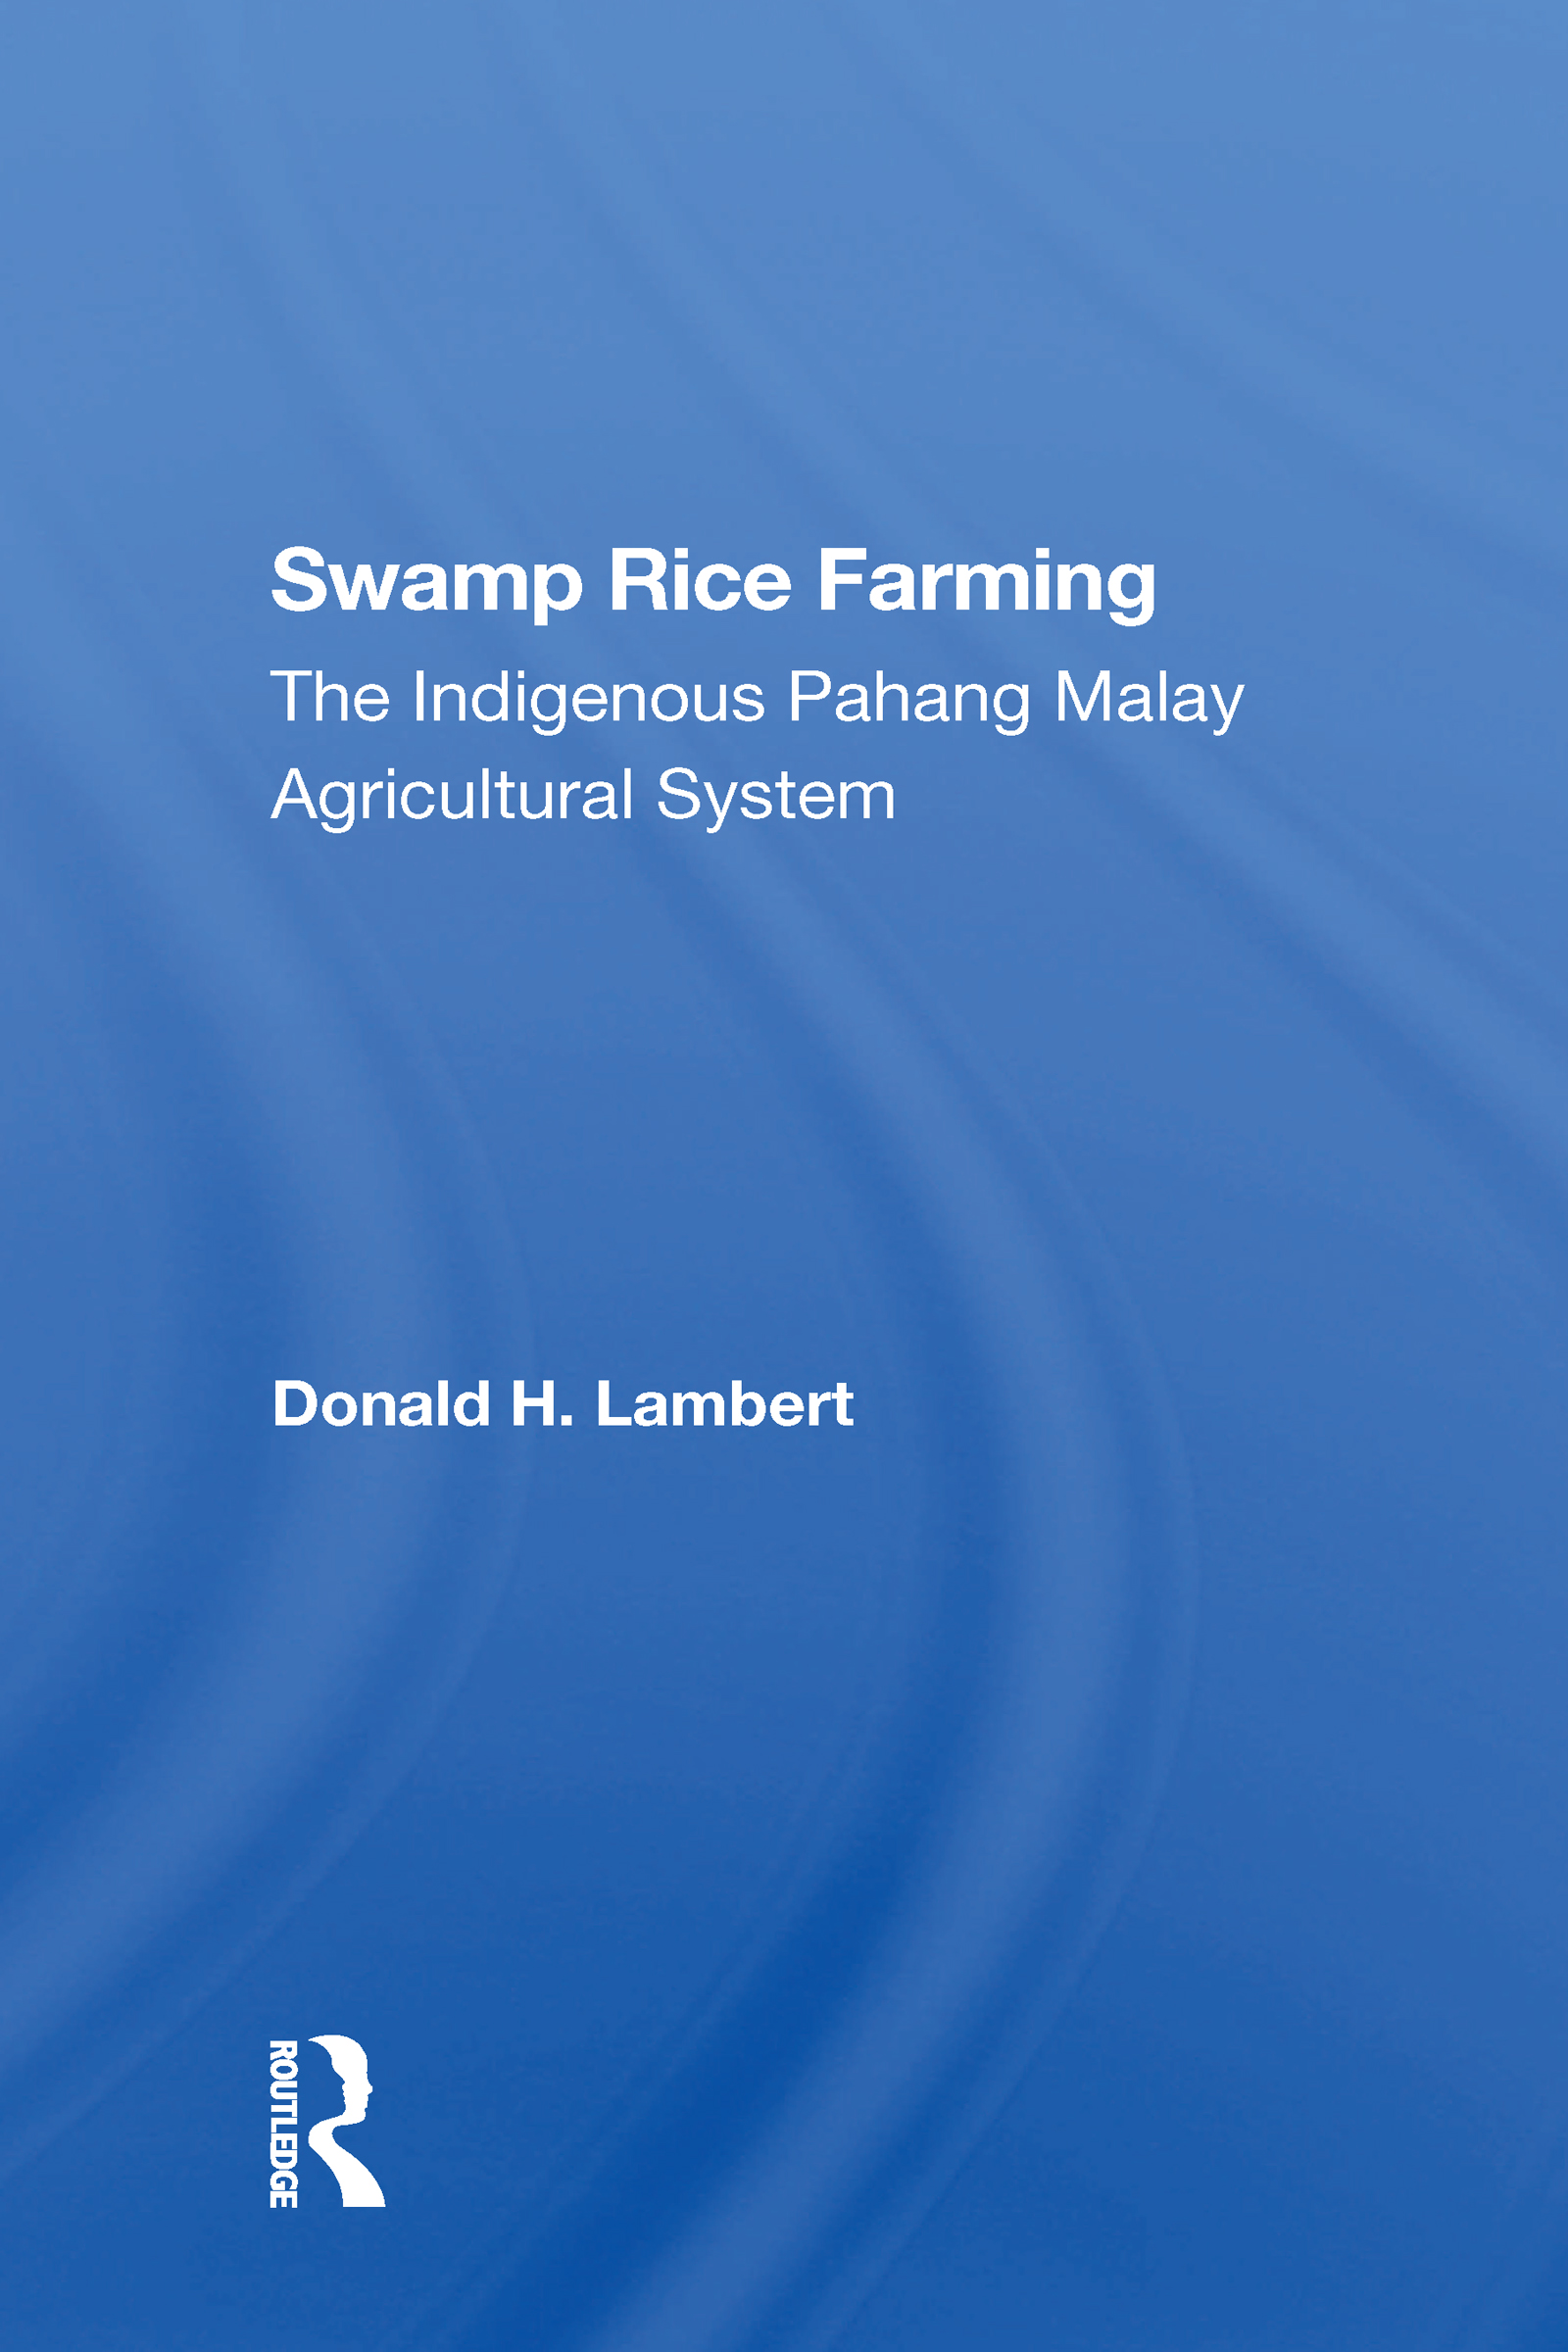 Swamp Rice Farming